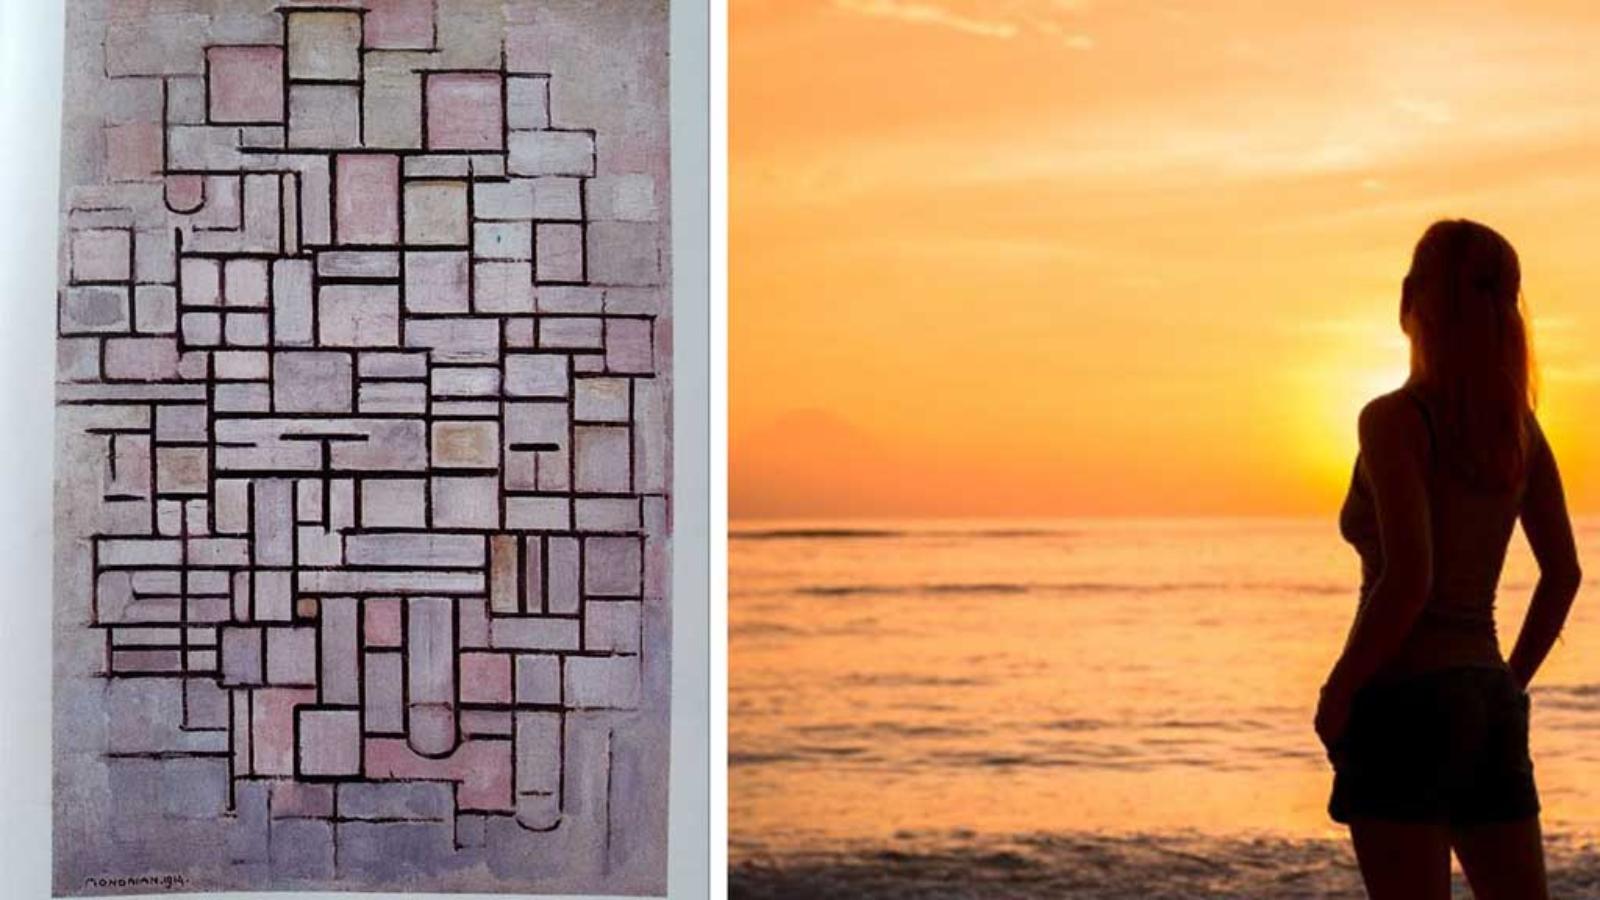 mondrian-tramonto